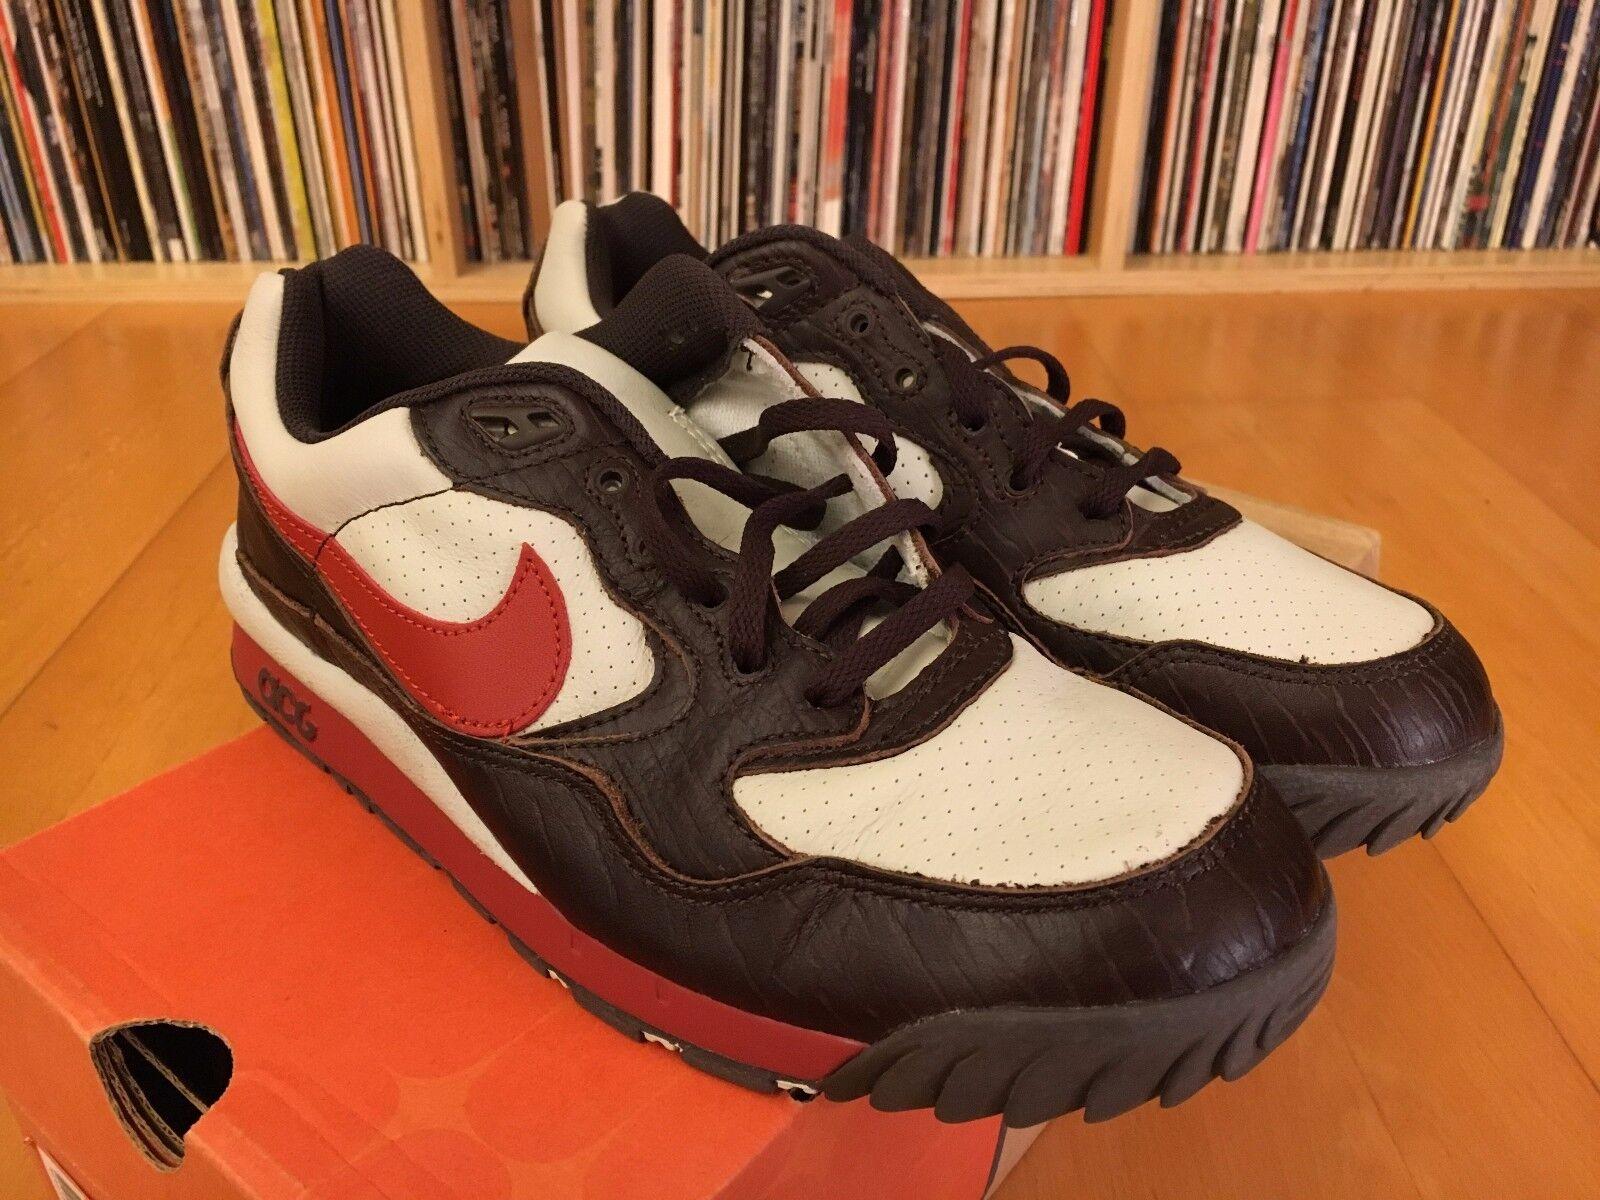 2018 Nike AIR WILDWOOD ACG PREMIUM Price reduction 306682-261 Price reduction Comfortable and good-looking